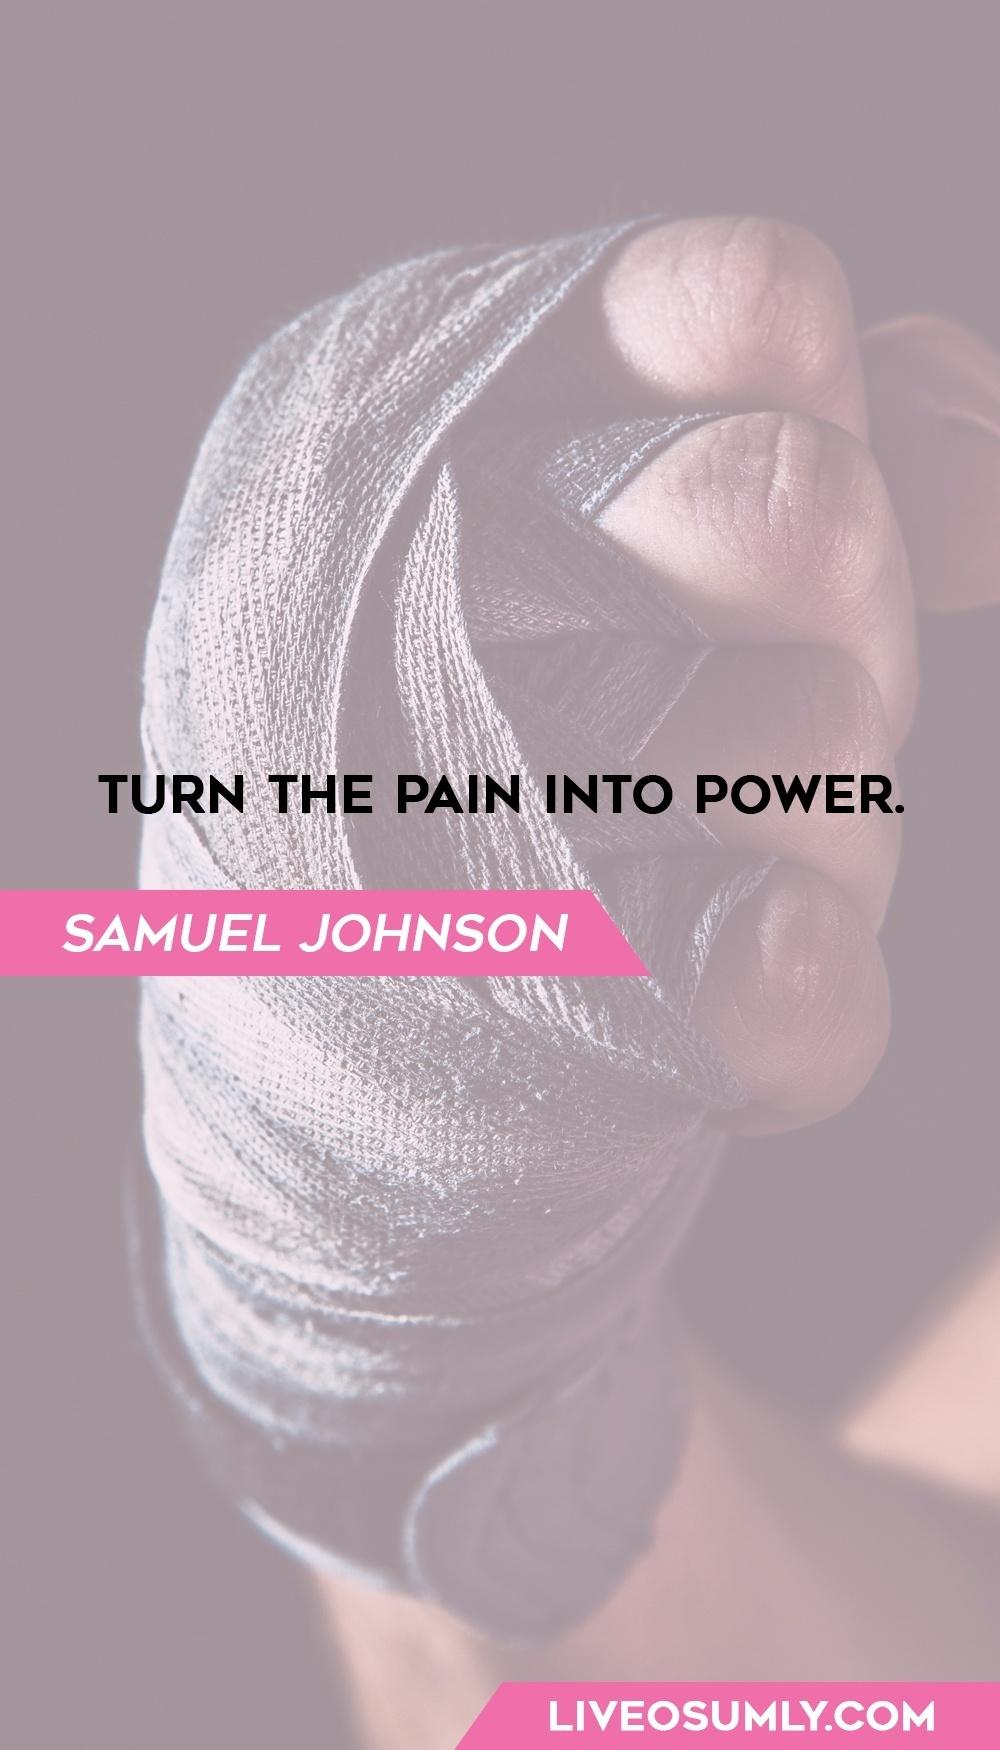 45. Samuel Johnson Quotes on Fitness